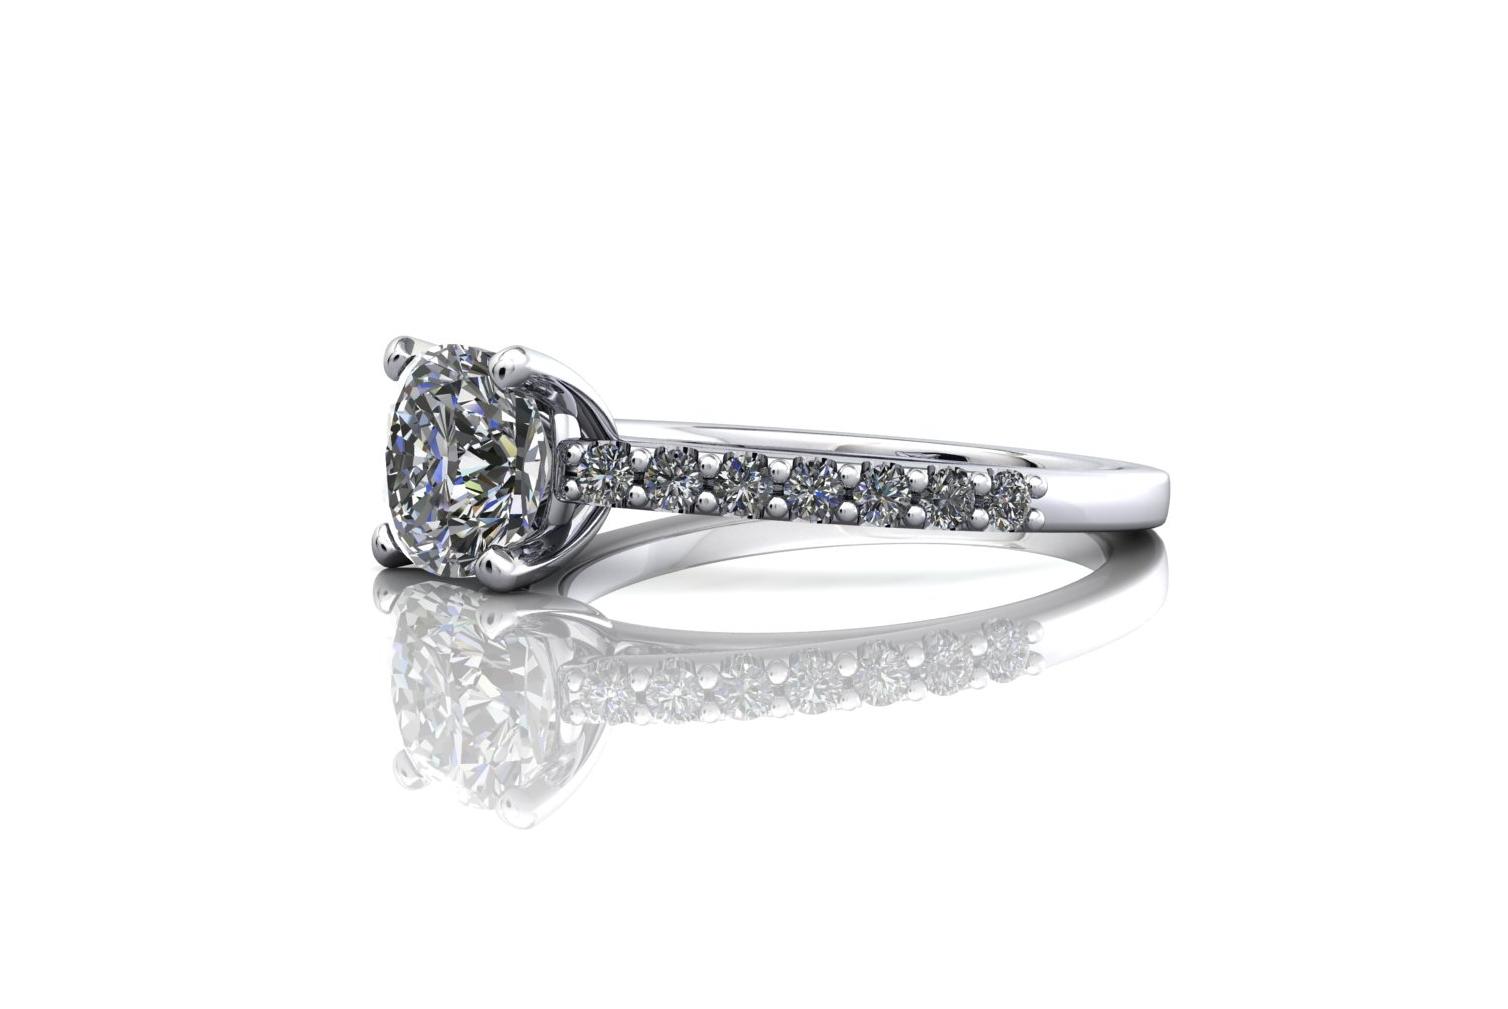 cushion cut engagement ring side